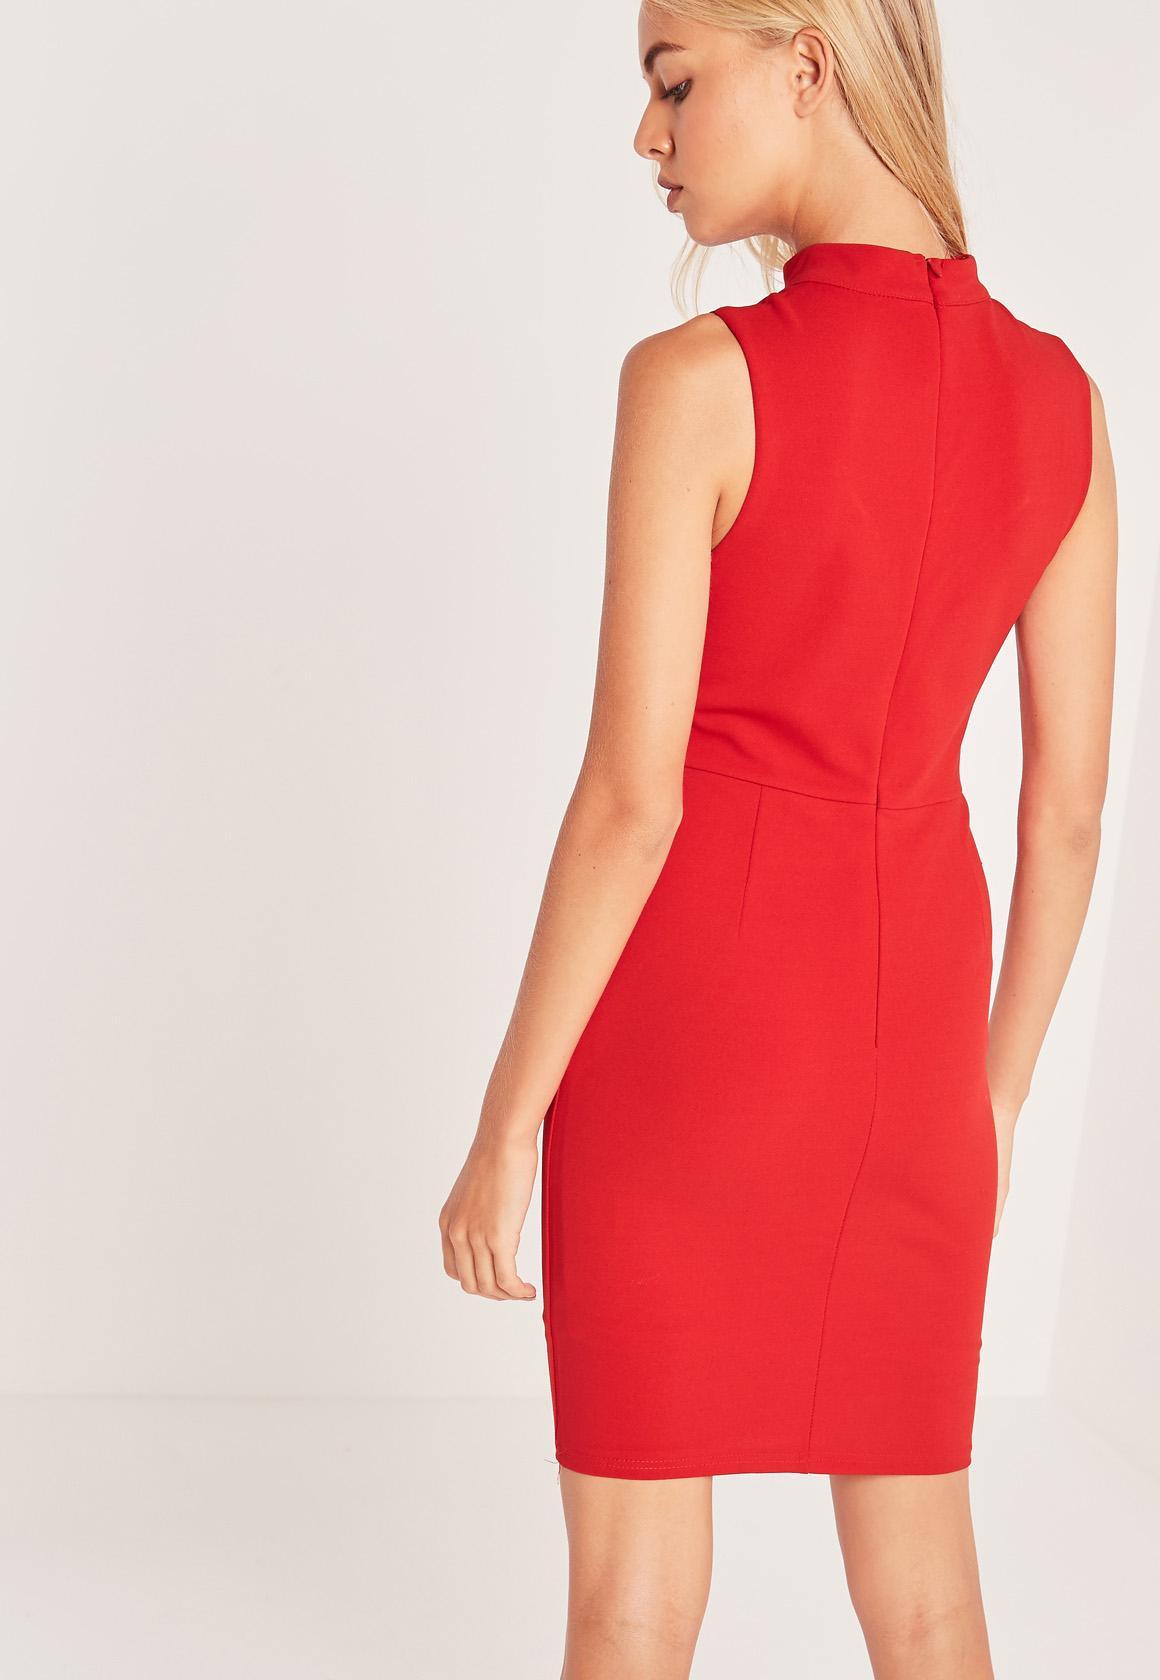 Choker Neck Sweetheart Dress Red